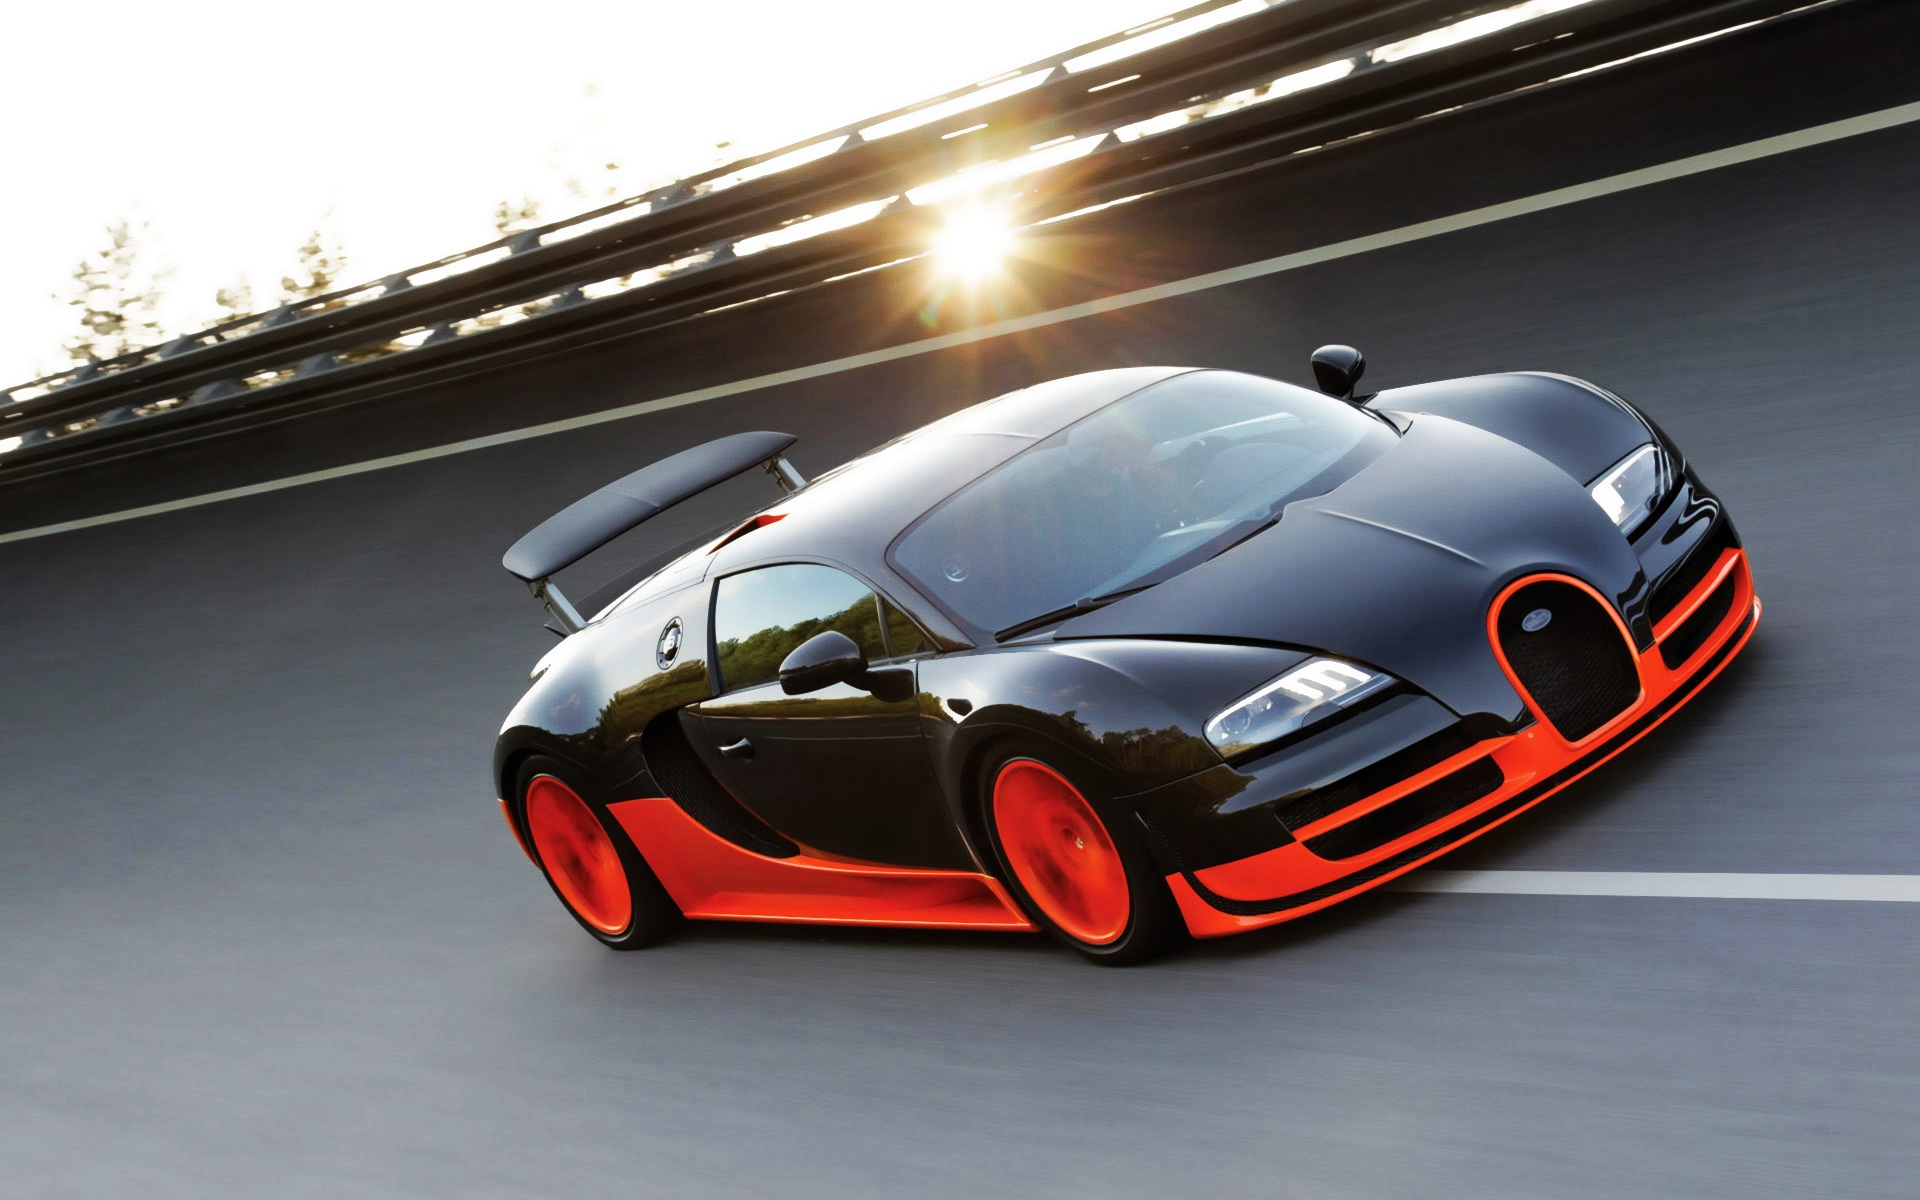 Bugatti Veyron SS 2010 Wallpapers HD Wallpapers 1920x1200